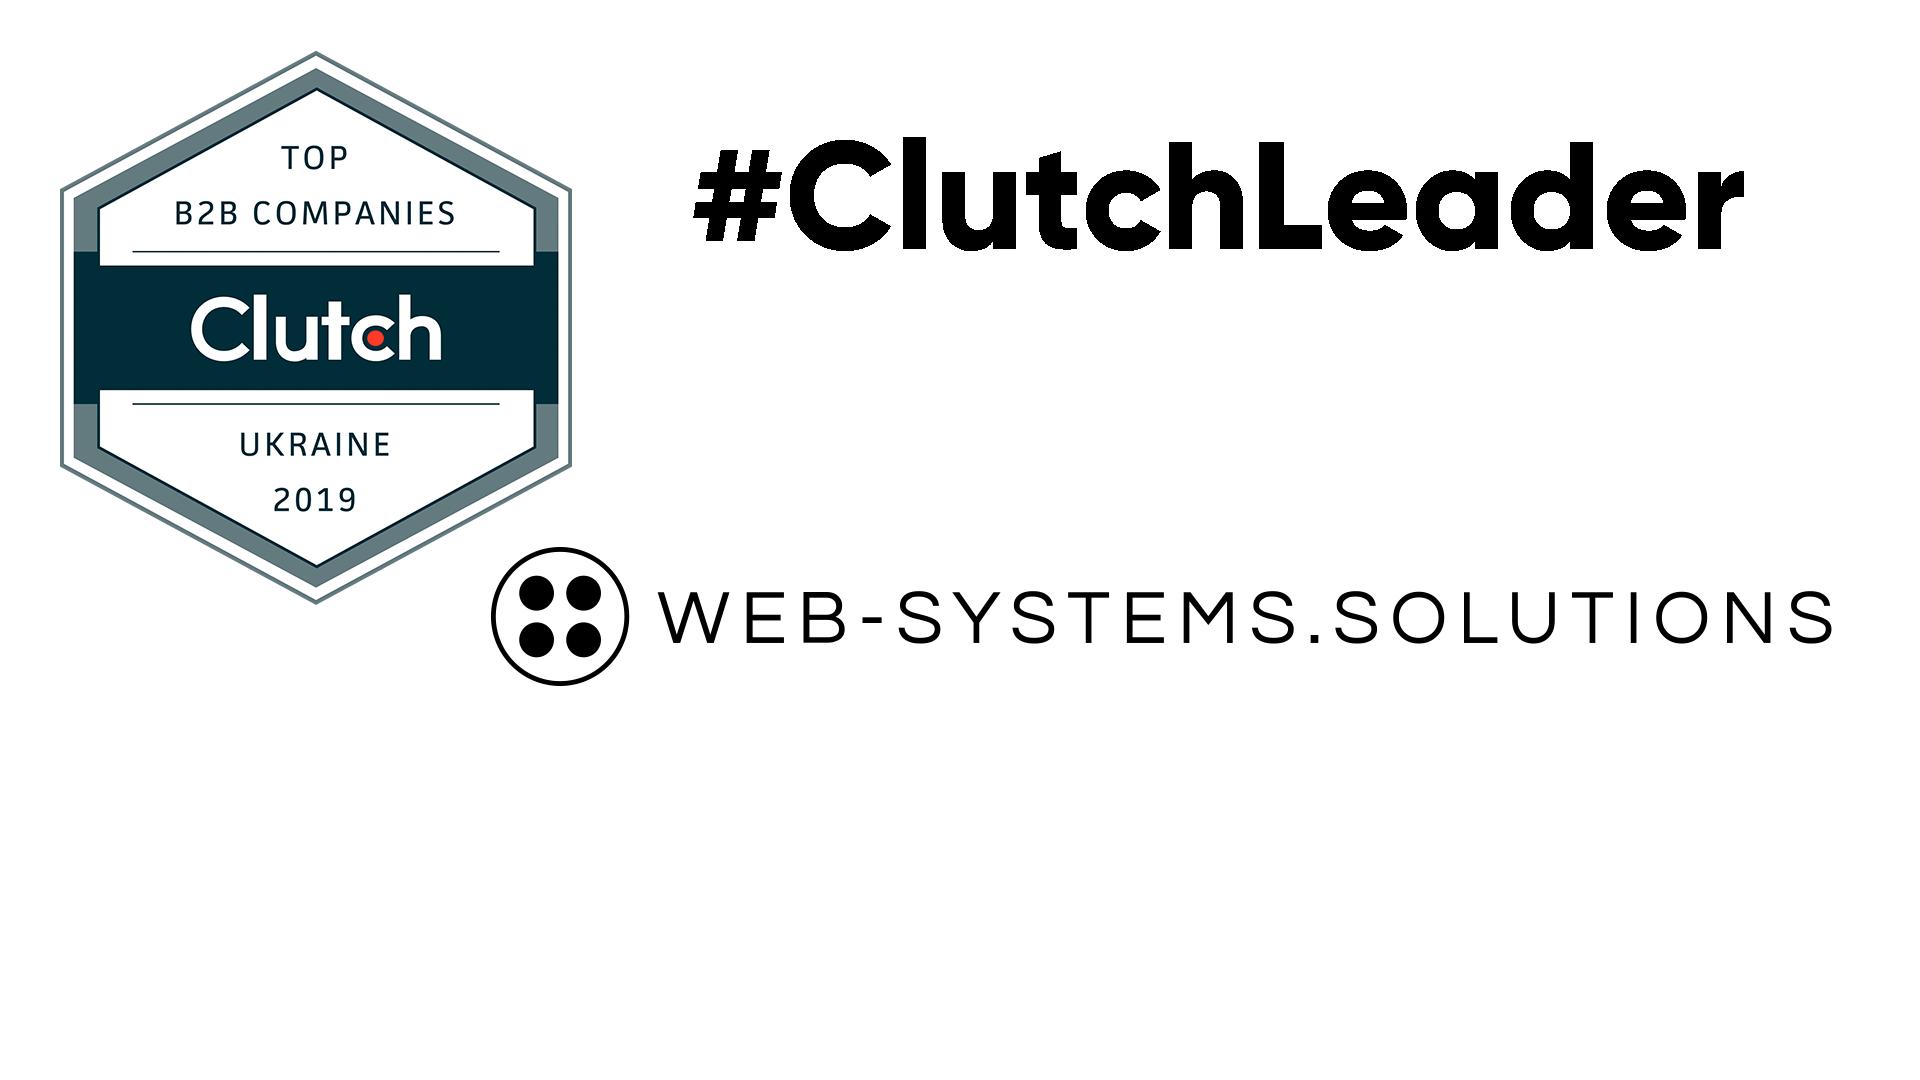 Clutch TOP B2B Company Award